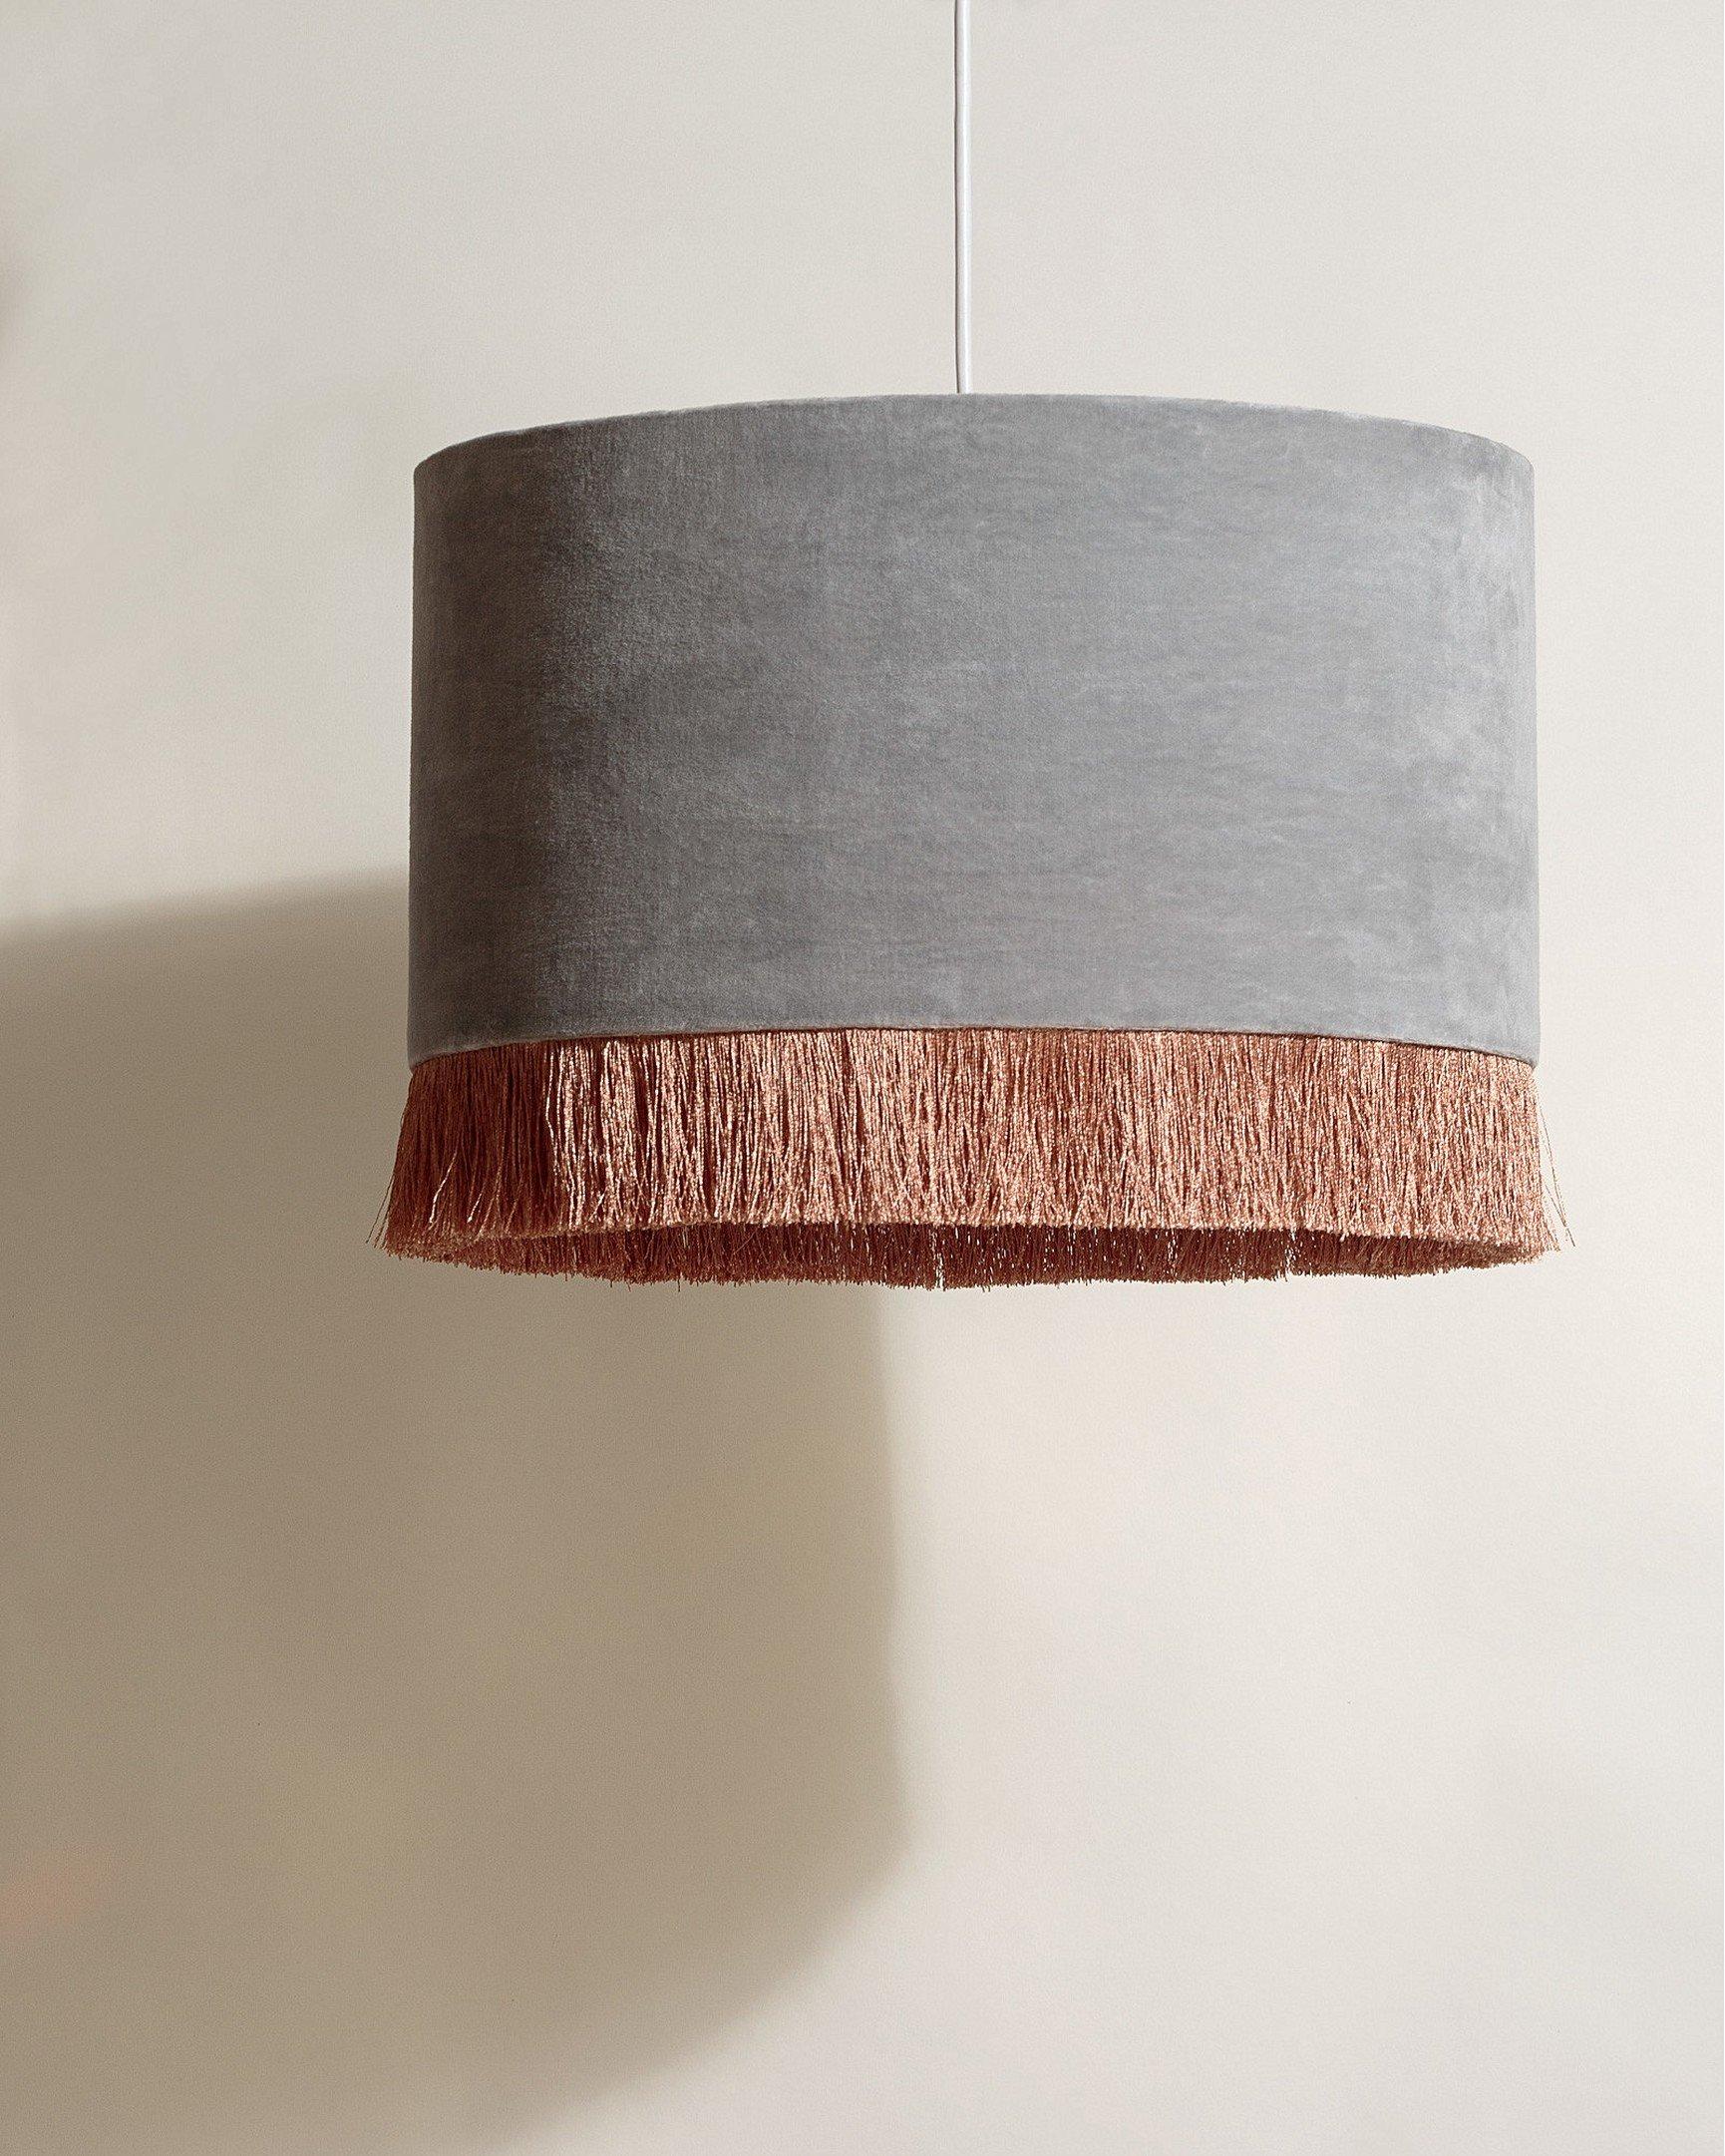 Lamps Amp Lighting Oliver Bonas